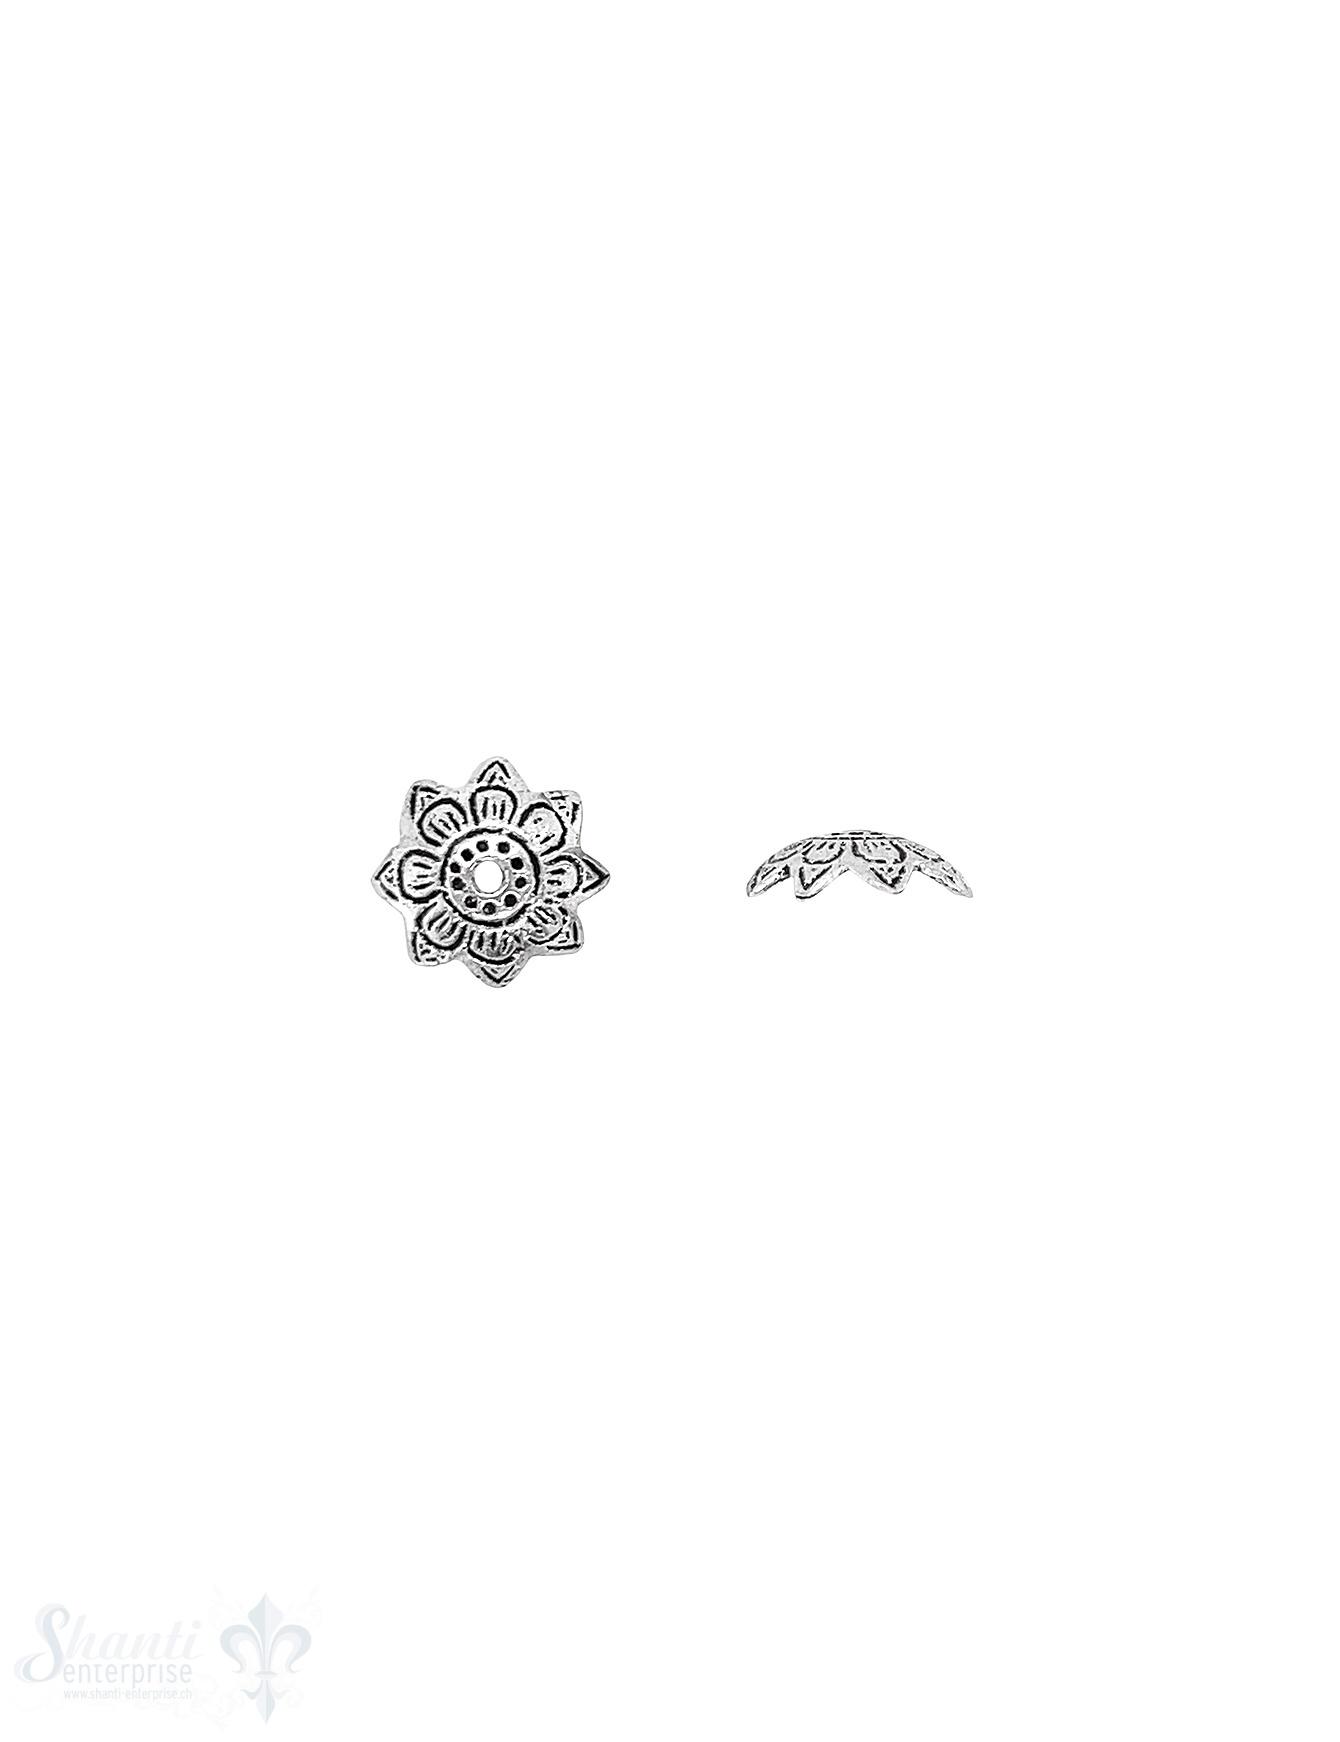 Ethno Perlkappe 11x4 mm Blüten doppelt eingeritzt